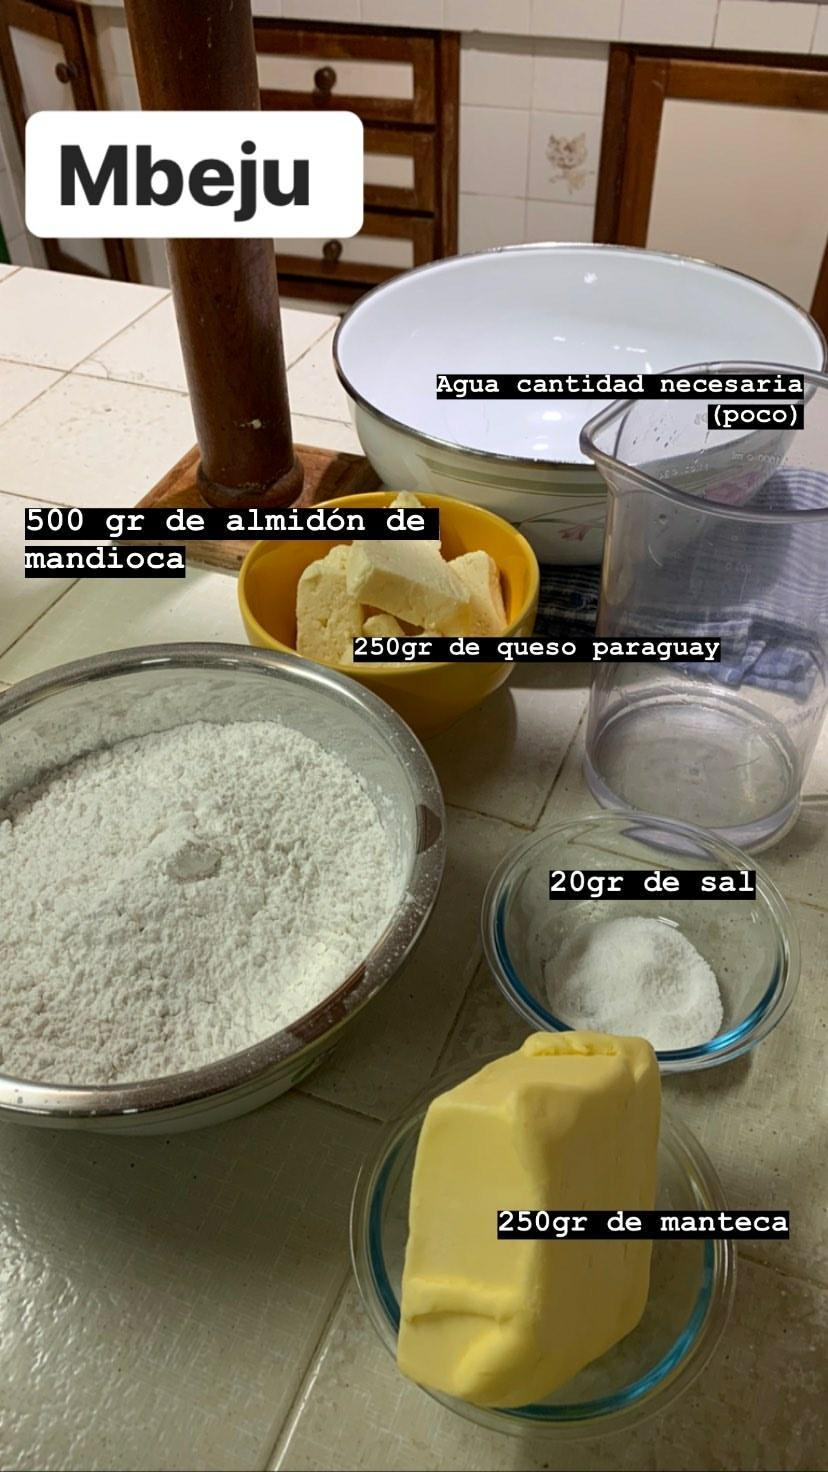 Ale Calcaterra On Twitter Ingredientes 500 Gr De Almidon De Mandioca 250 Gr Queso Paraguay 259 Gr De Manteca 20 Gr De Sal Agua Cantidad Necesaria Https T Co Cztorllxjz